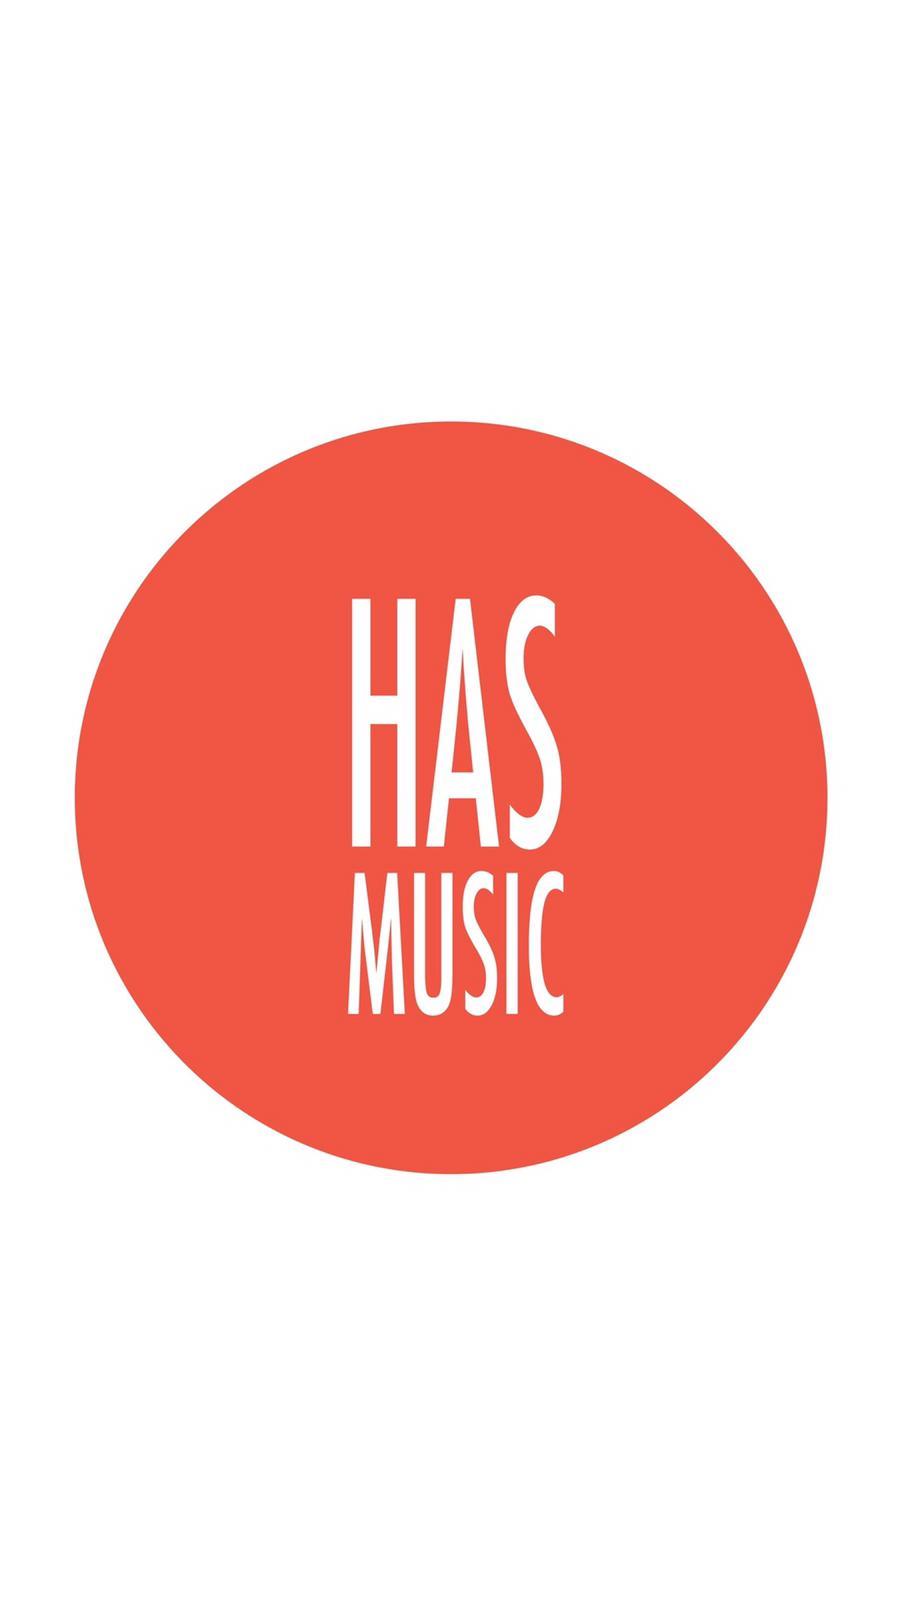 HAS MUSIC